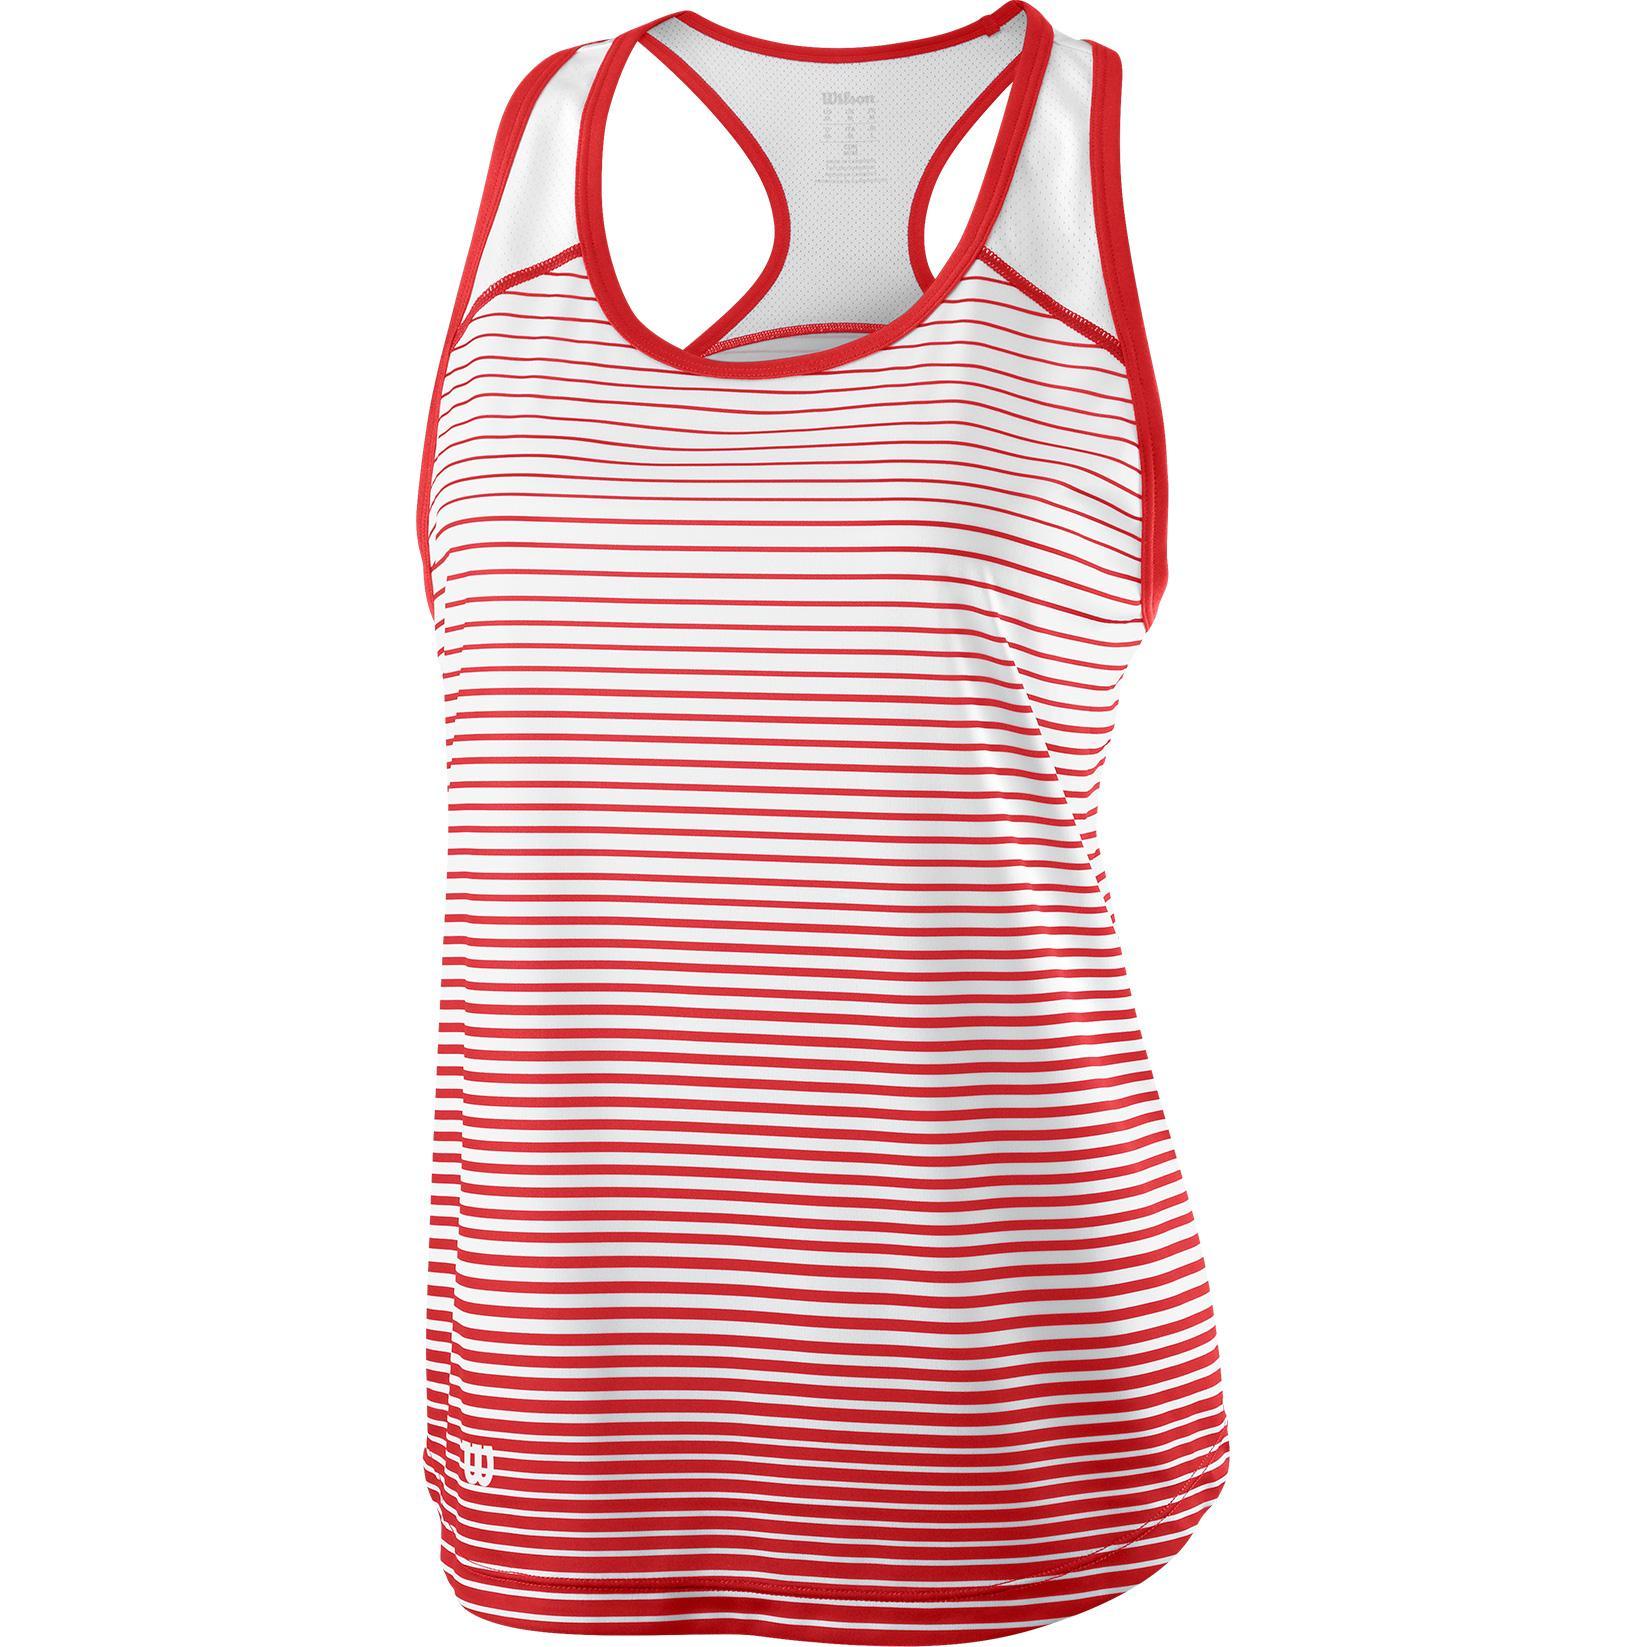 b948b1f229e694 Wilson Womens Striped Tank Top - Red White - Tennisnuts.com